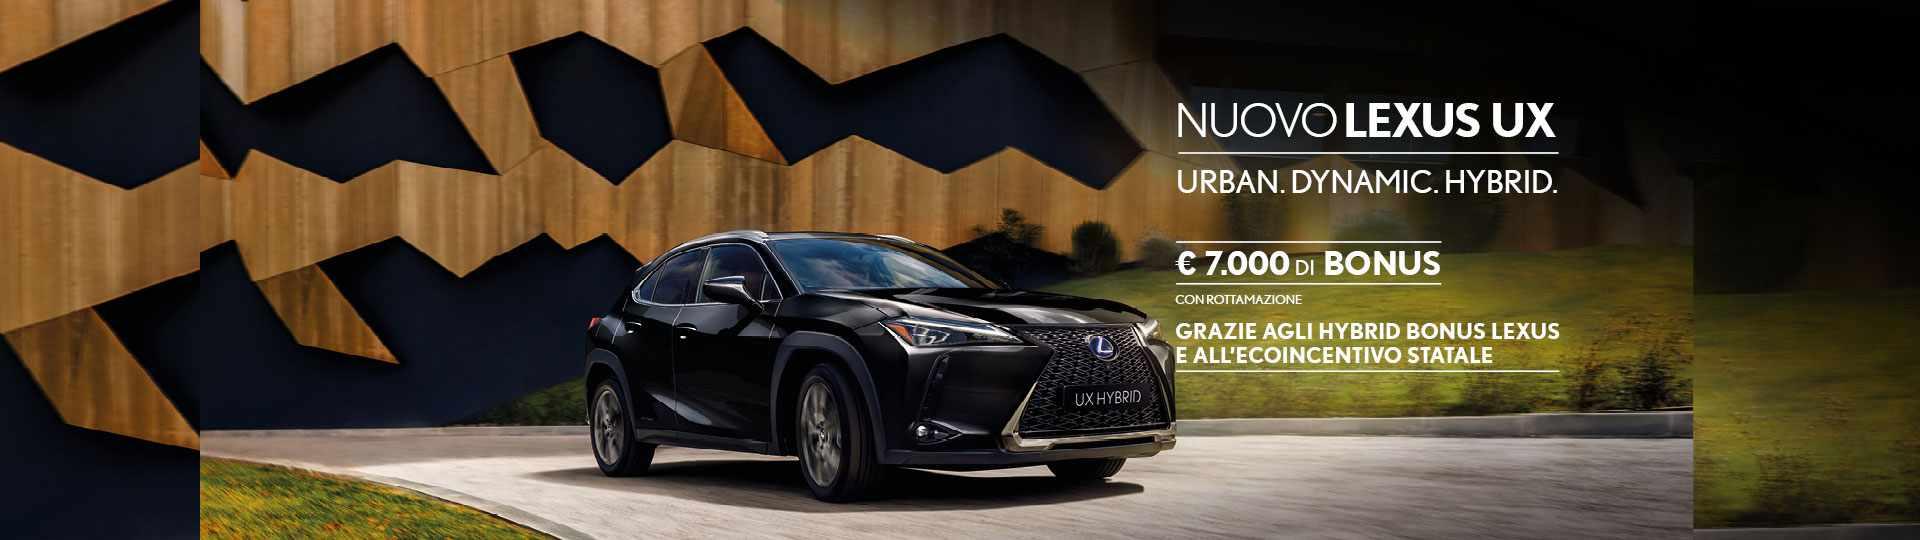 Lexus-UX_sito_gennaio-2021-min.jpg